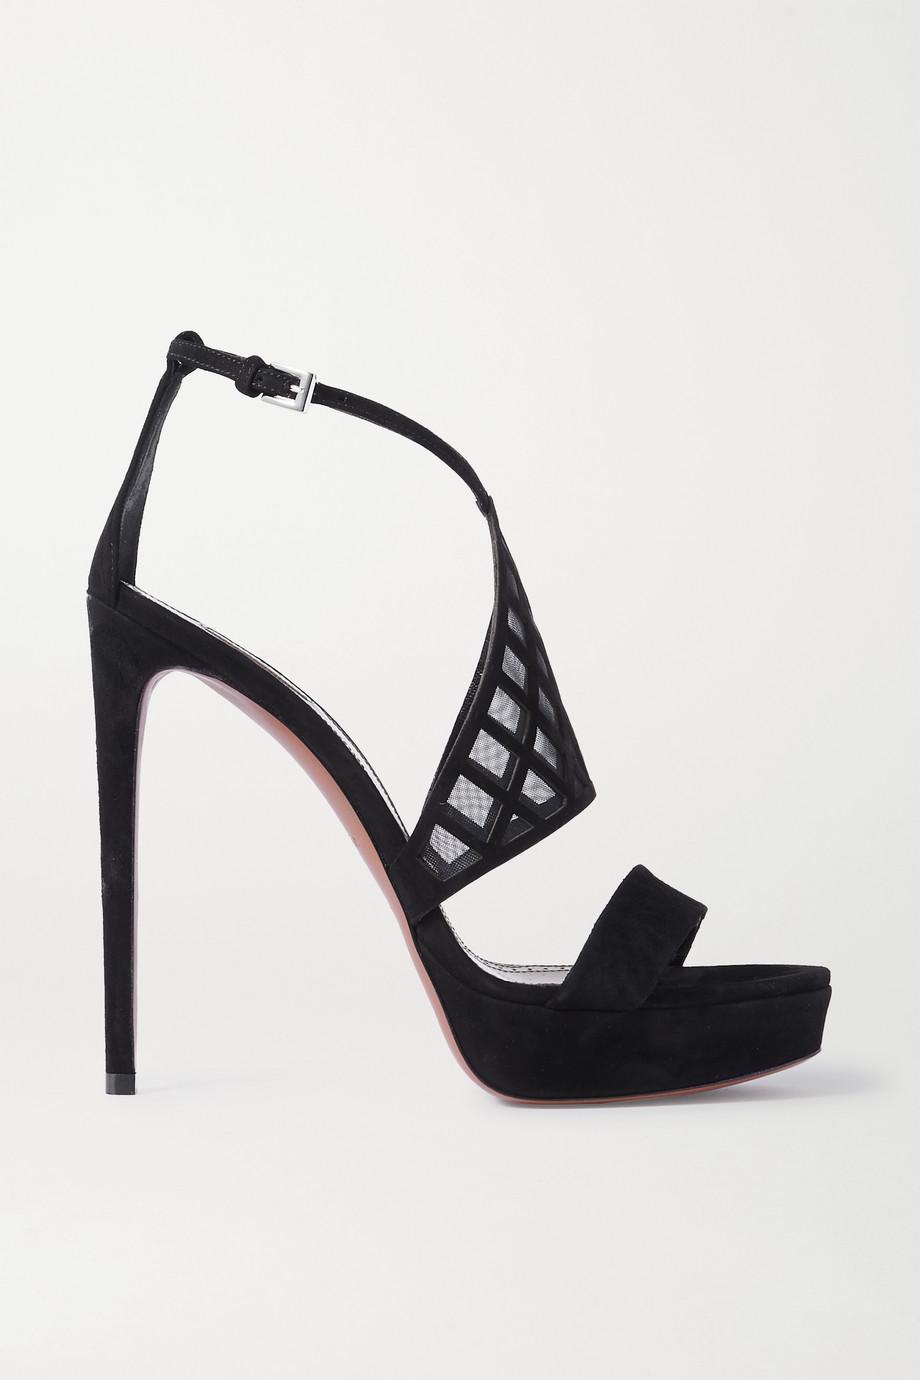 Alaïa 145 suede and mesh platform sandals